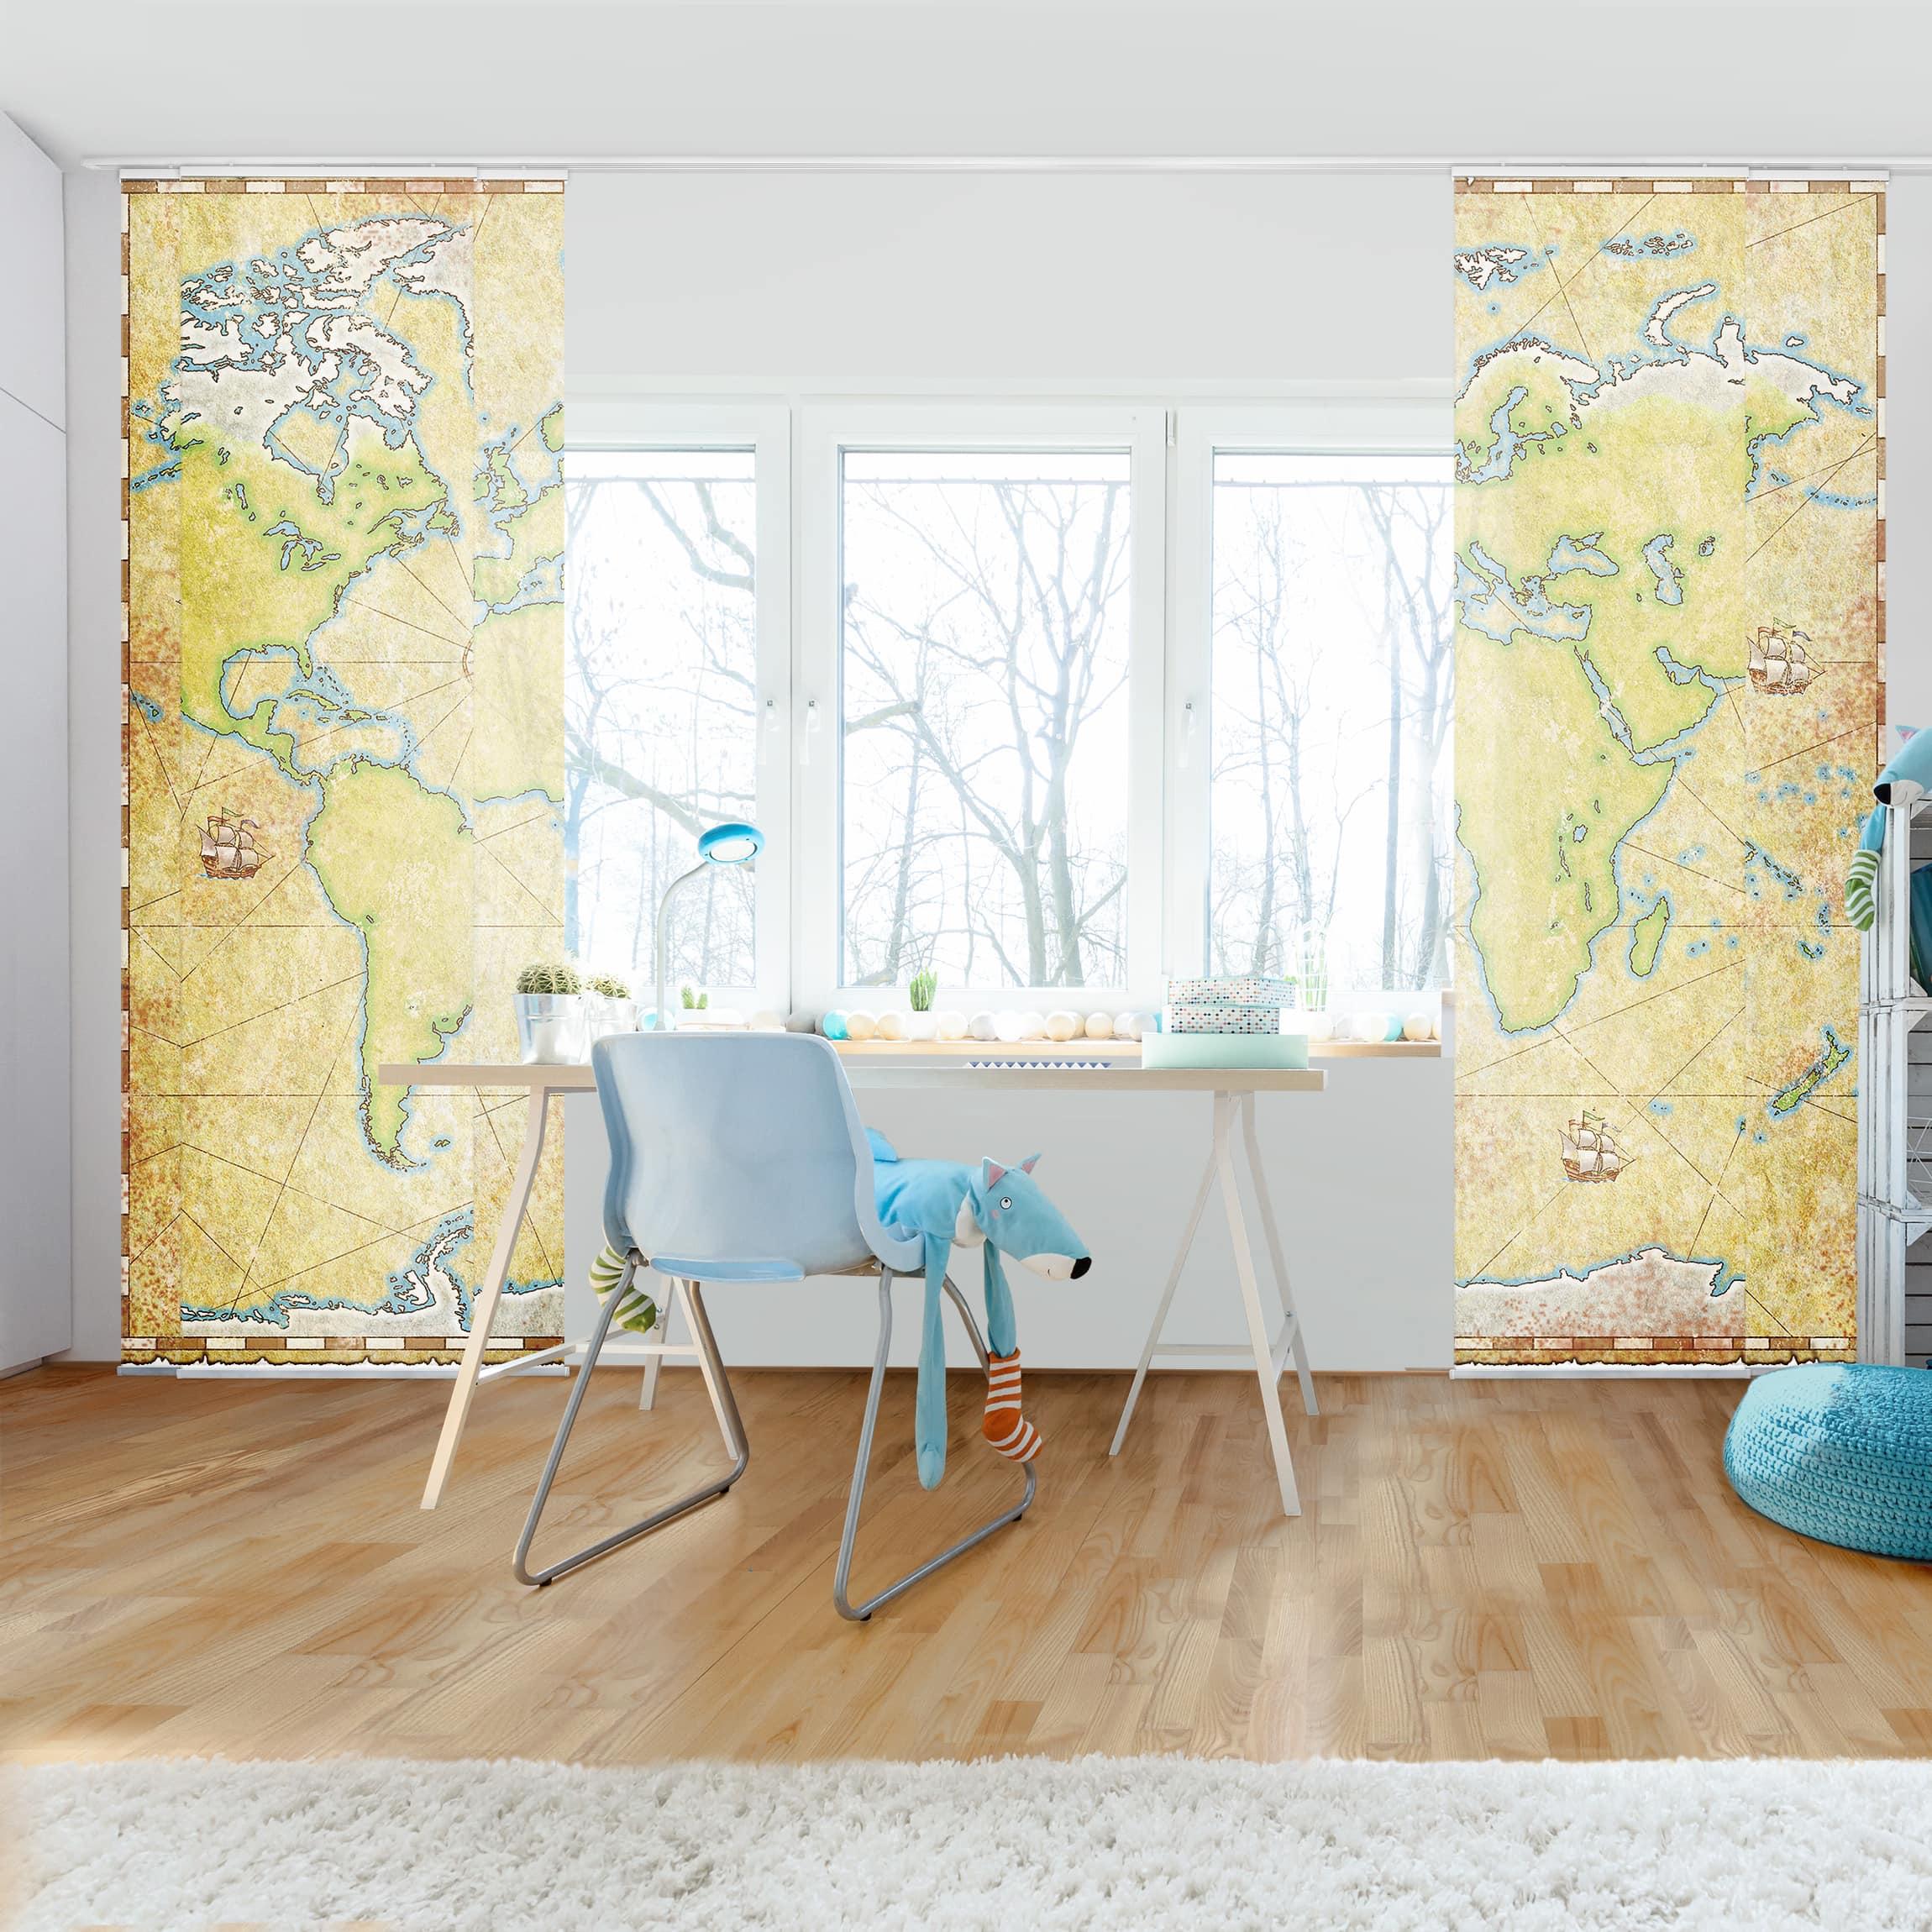 schiebegardinen set world map 6 fl chenvorh nge. Black Bedroom Furniture Sets. Home Design Ideas